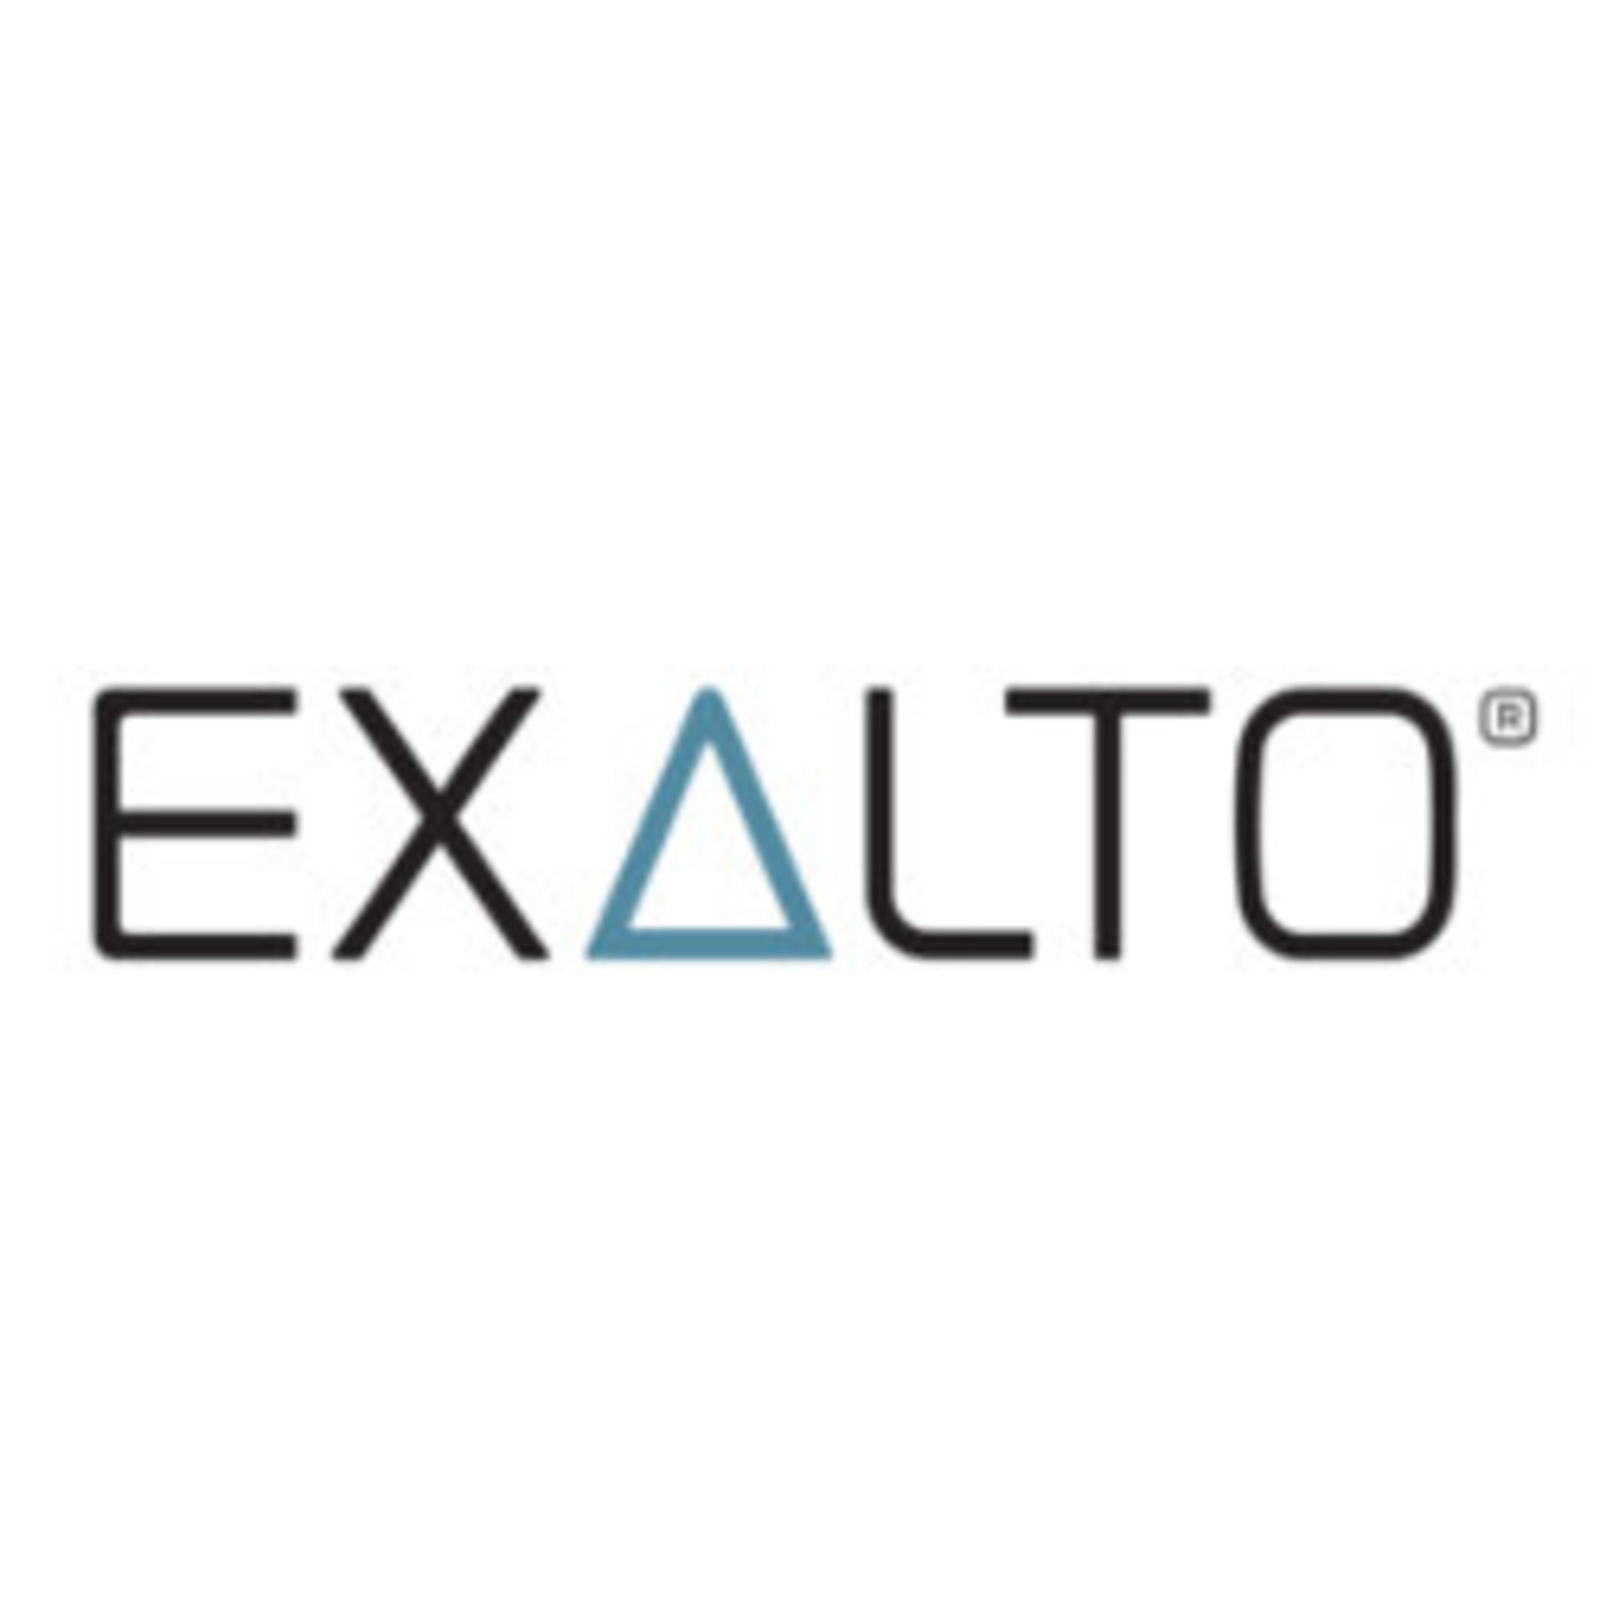 EXALTO Eyewear